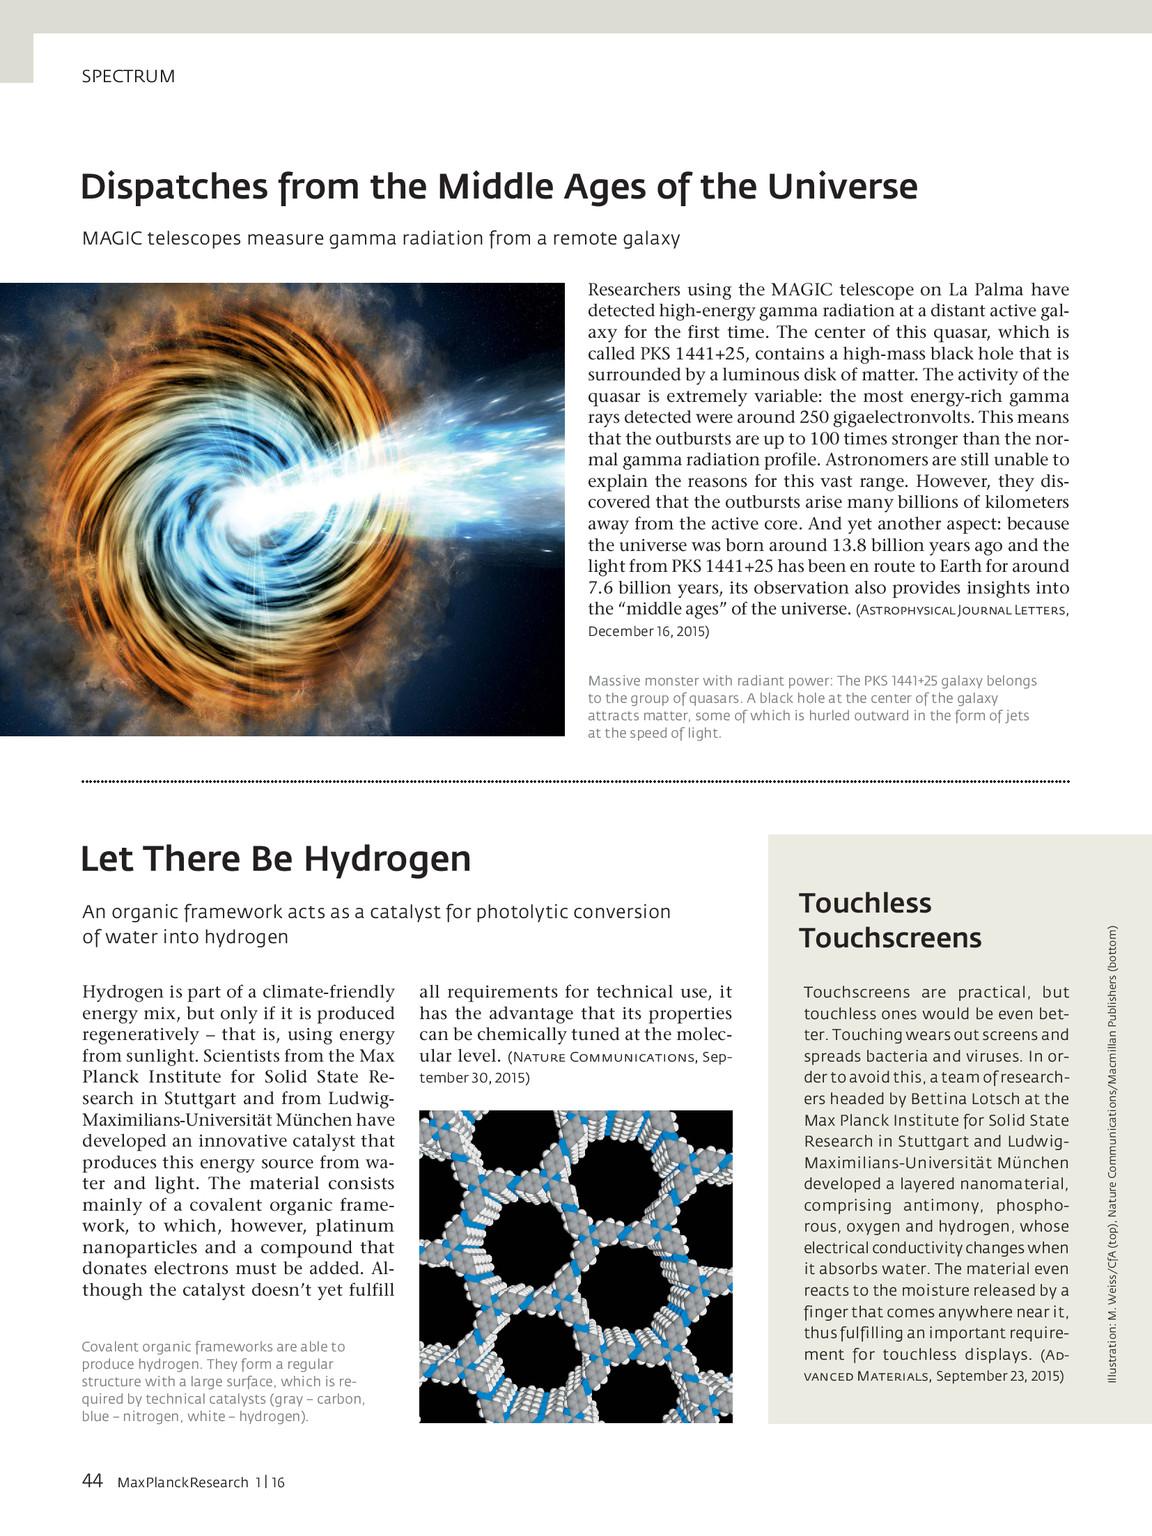 MPR 1/16 | Max Planck Research